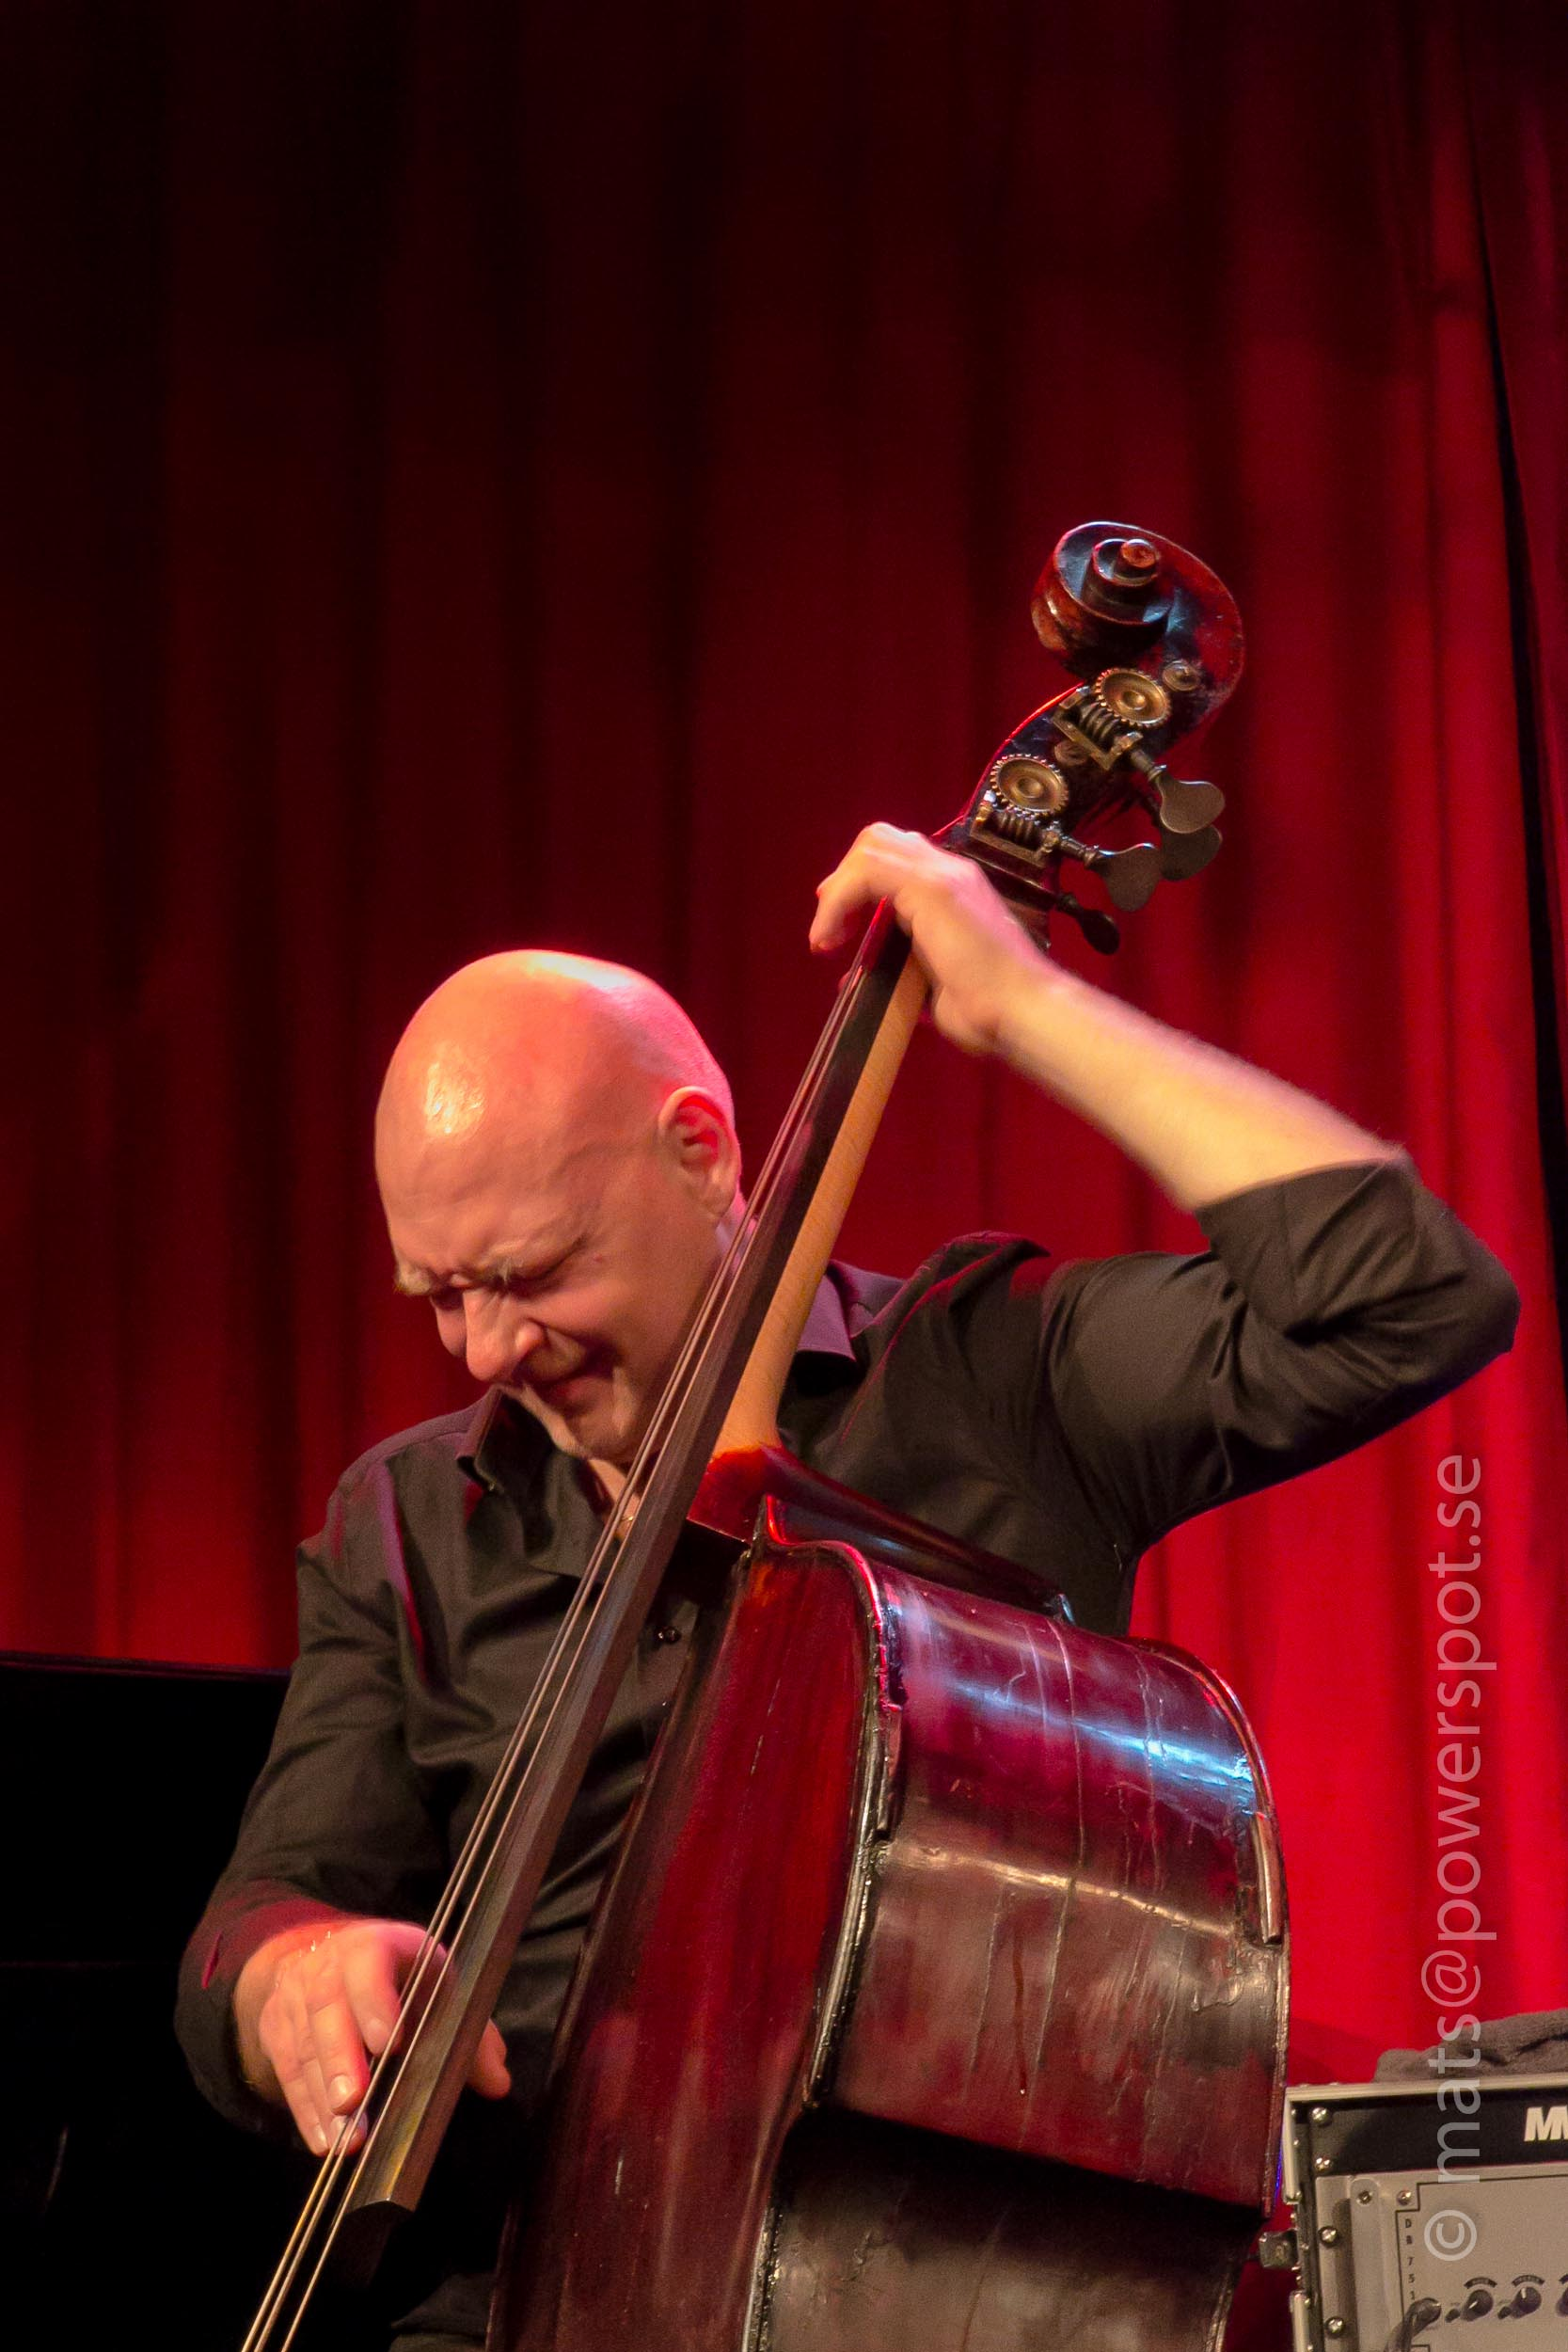 Sth Jazz: Magnus Öström Group/Dan Berglunds Tonbruket